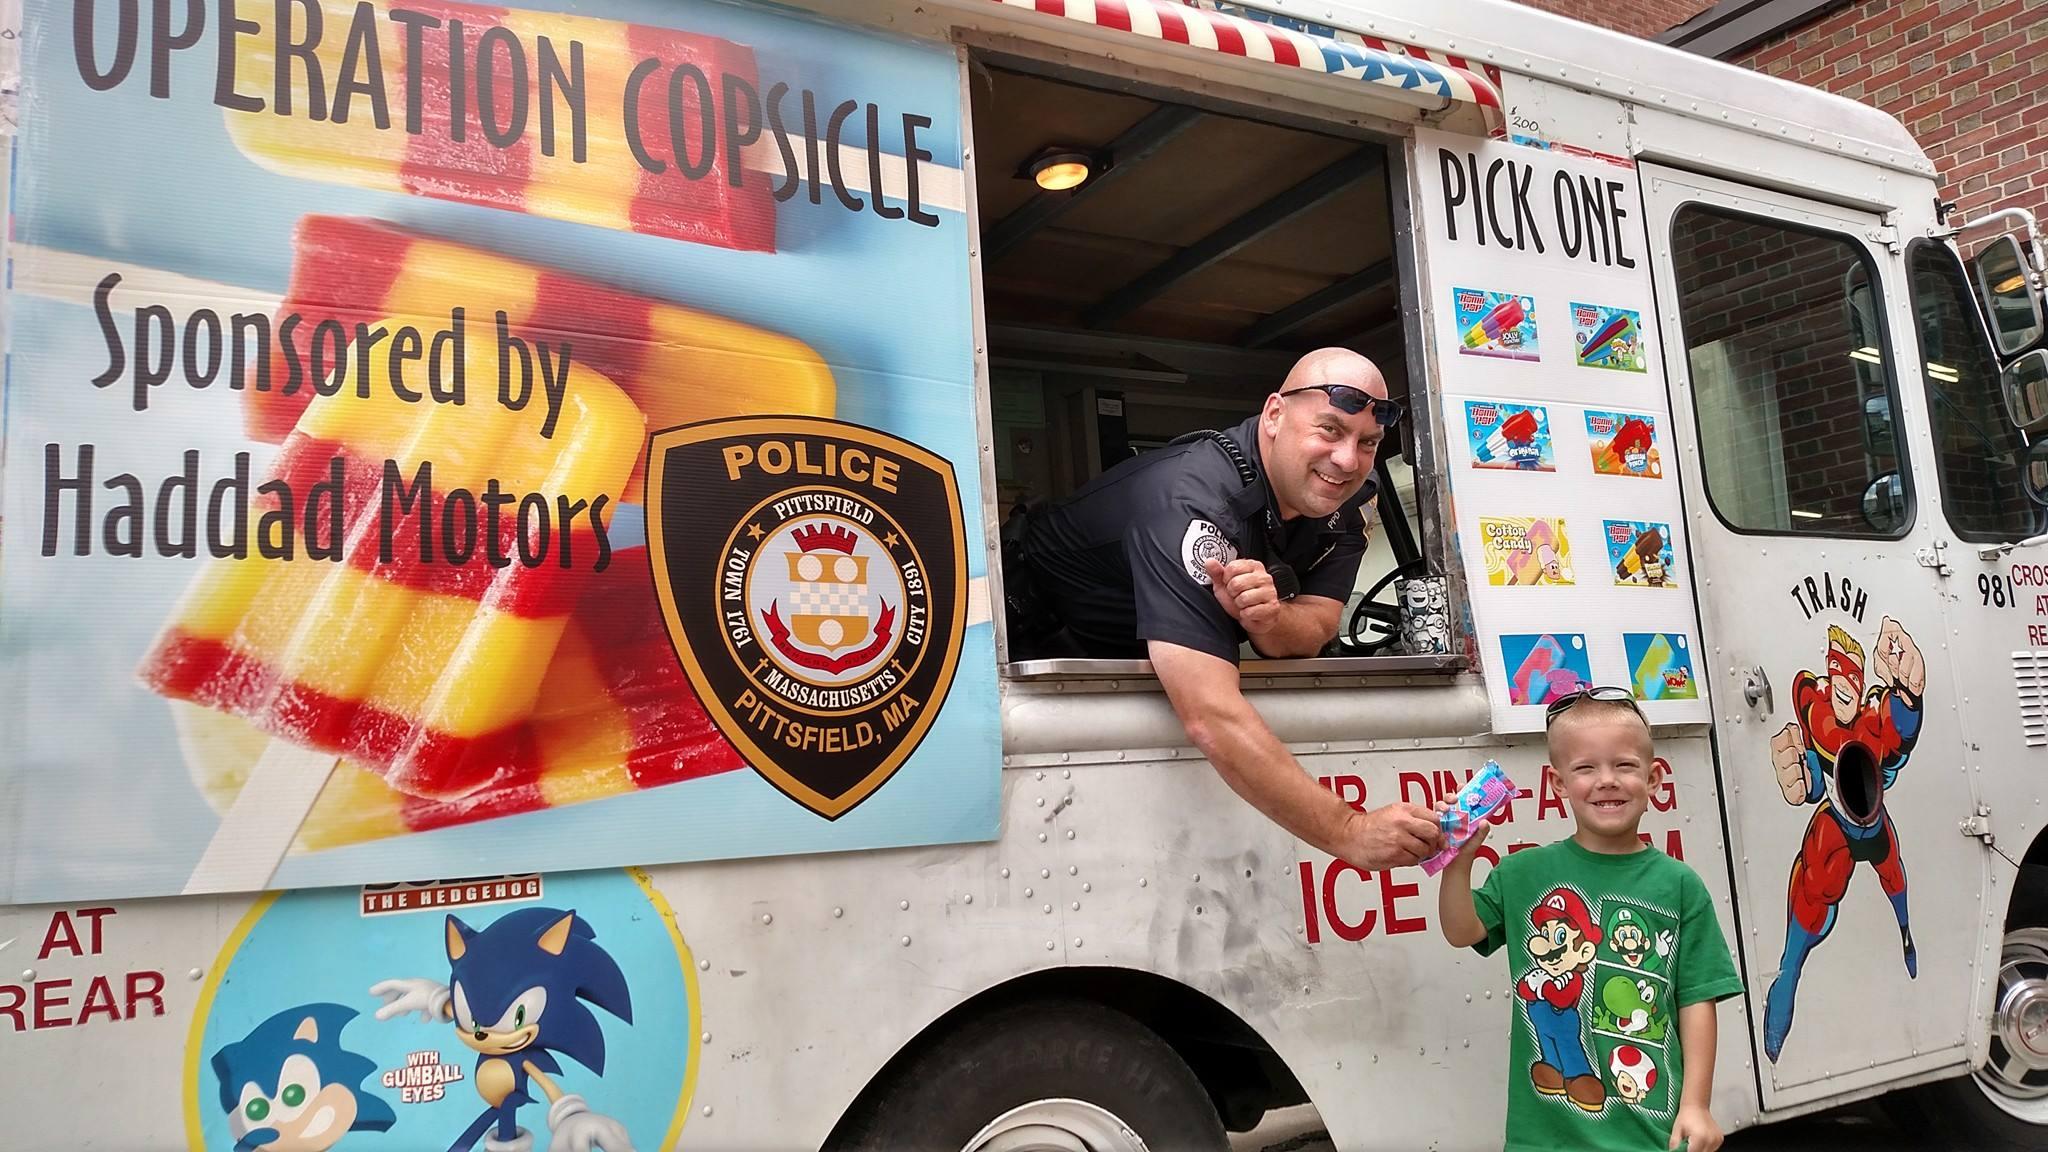 ice cream truck_456892